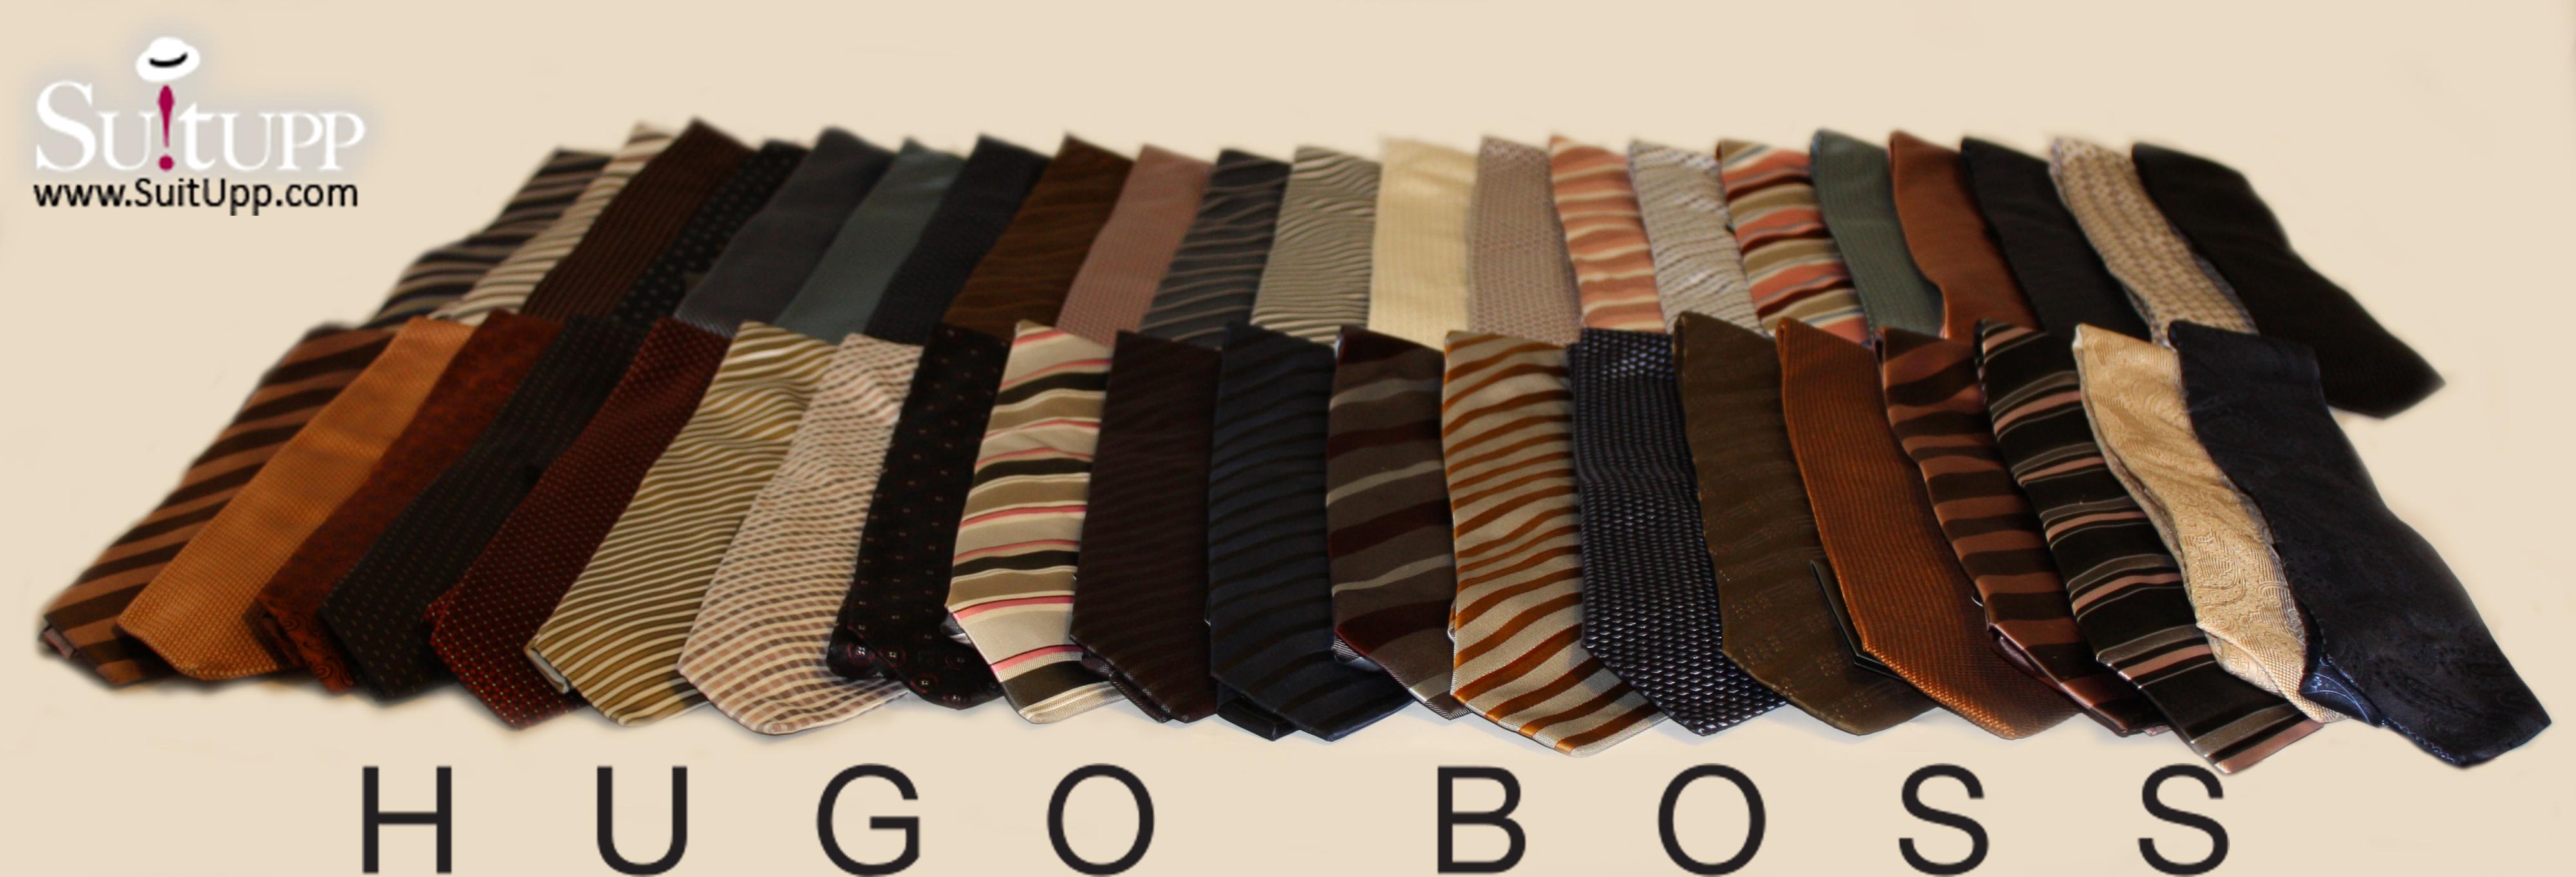 Hugo Boss Ties Collection